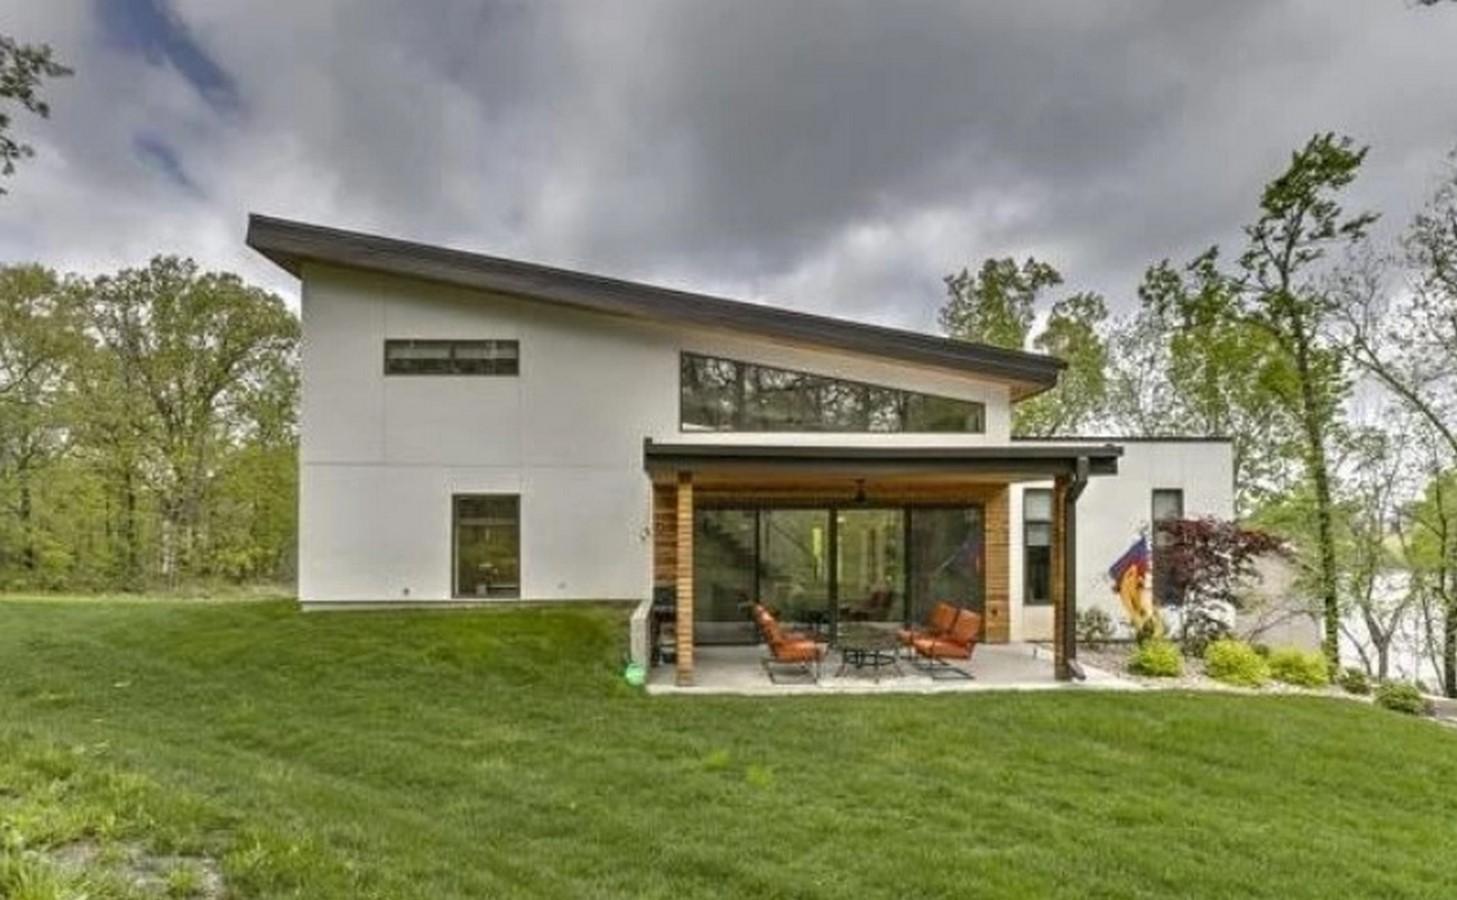 Architects in Kansas city - Top 90 Architects in Kansas city - Sheet13